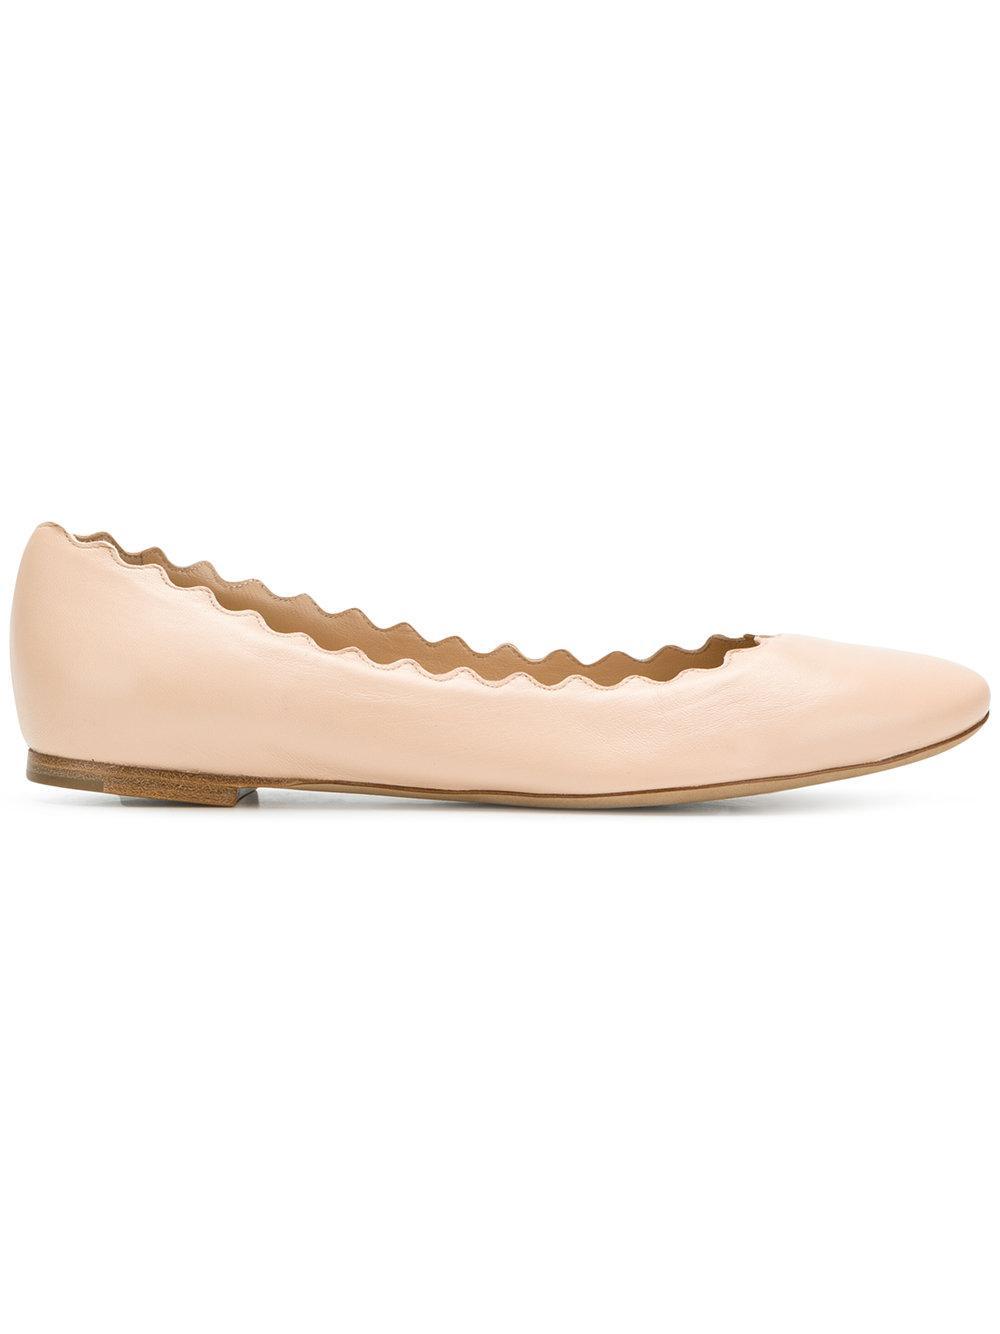 a636e1b9c18 ChloÉ Frilled Craft Ballerina Shoes   ModeSens